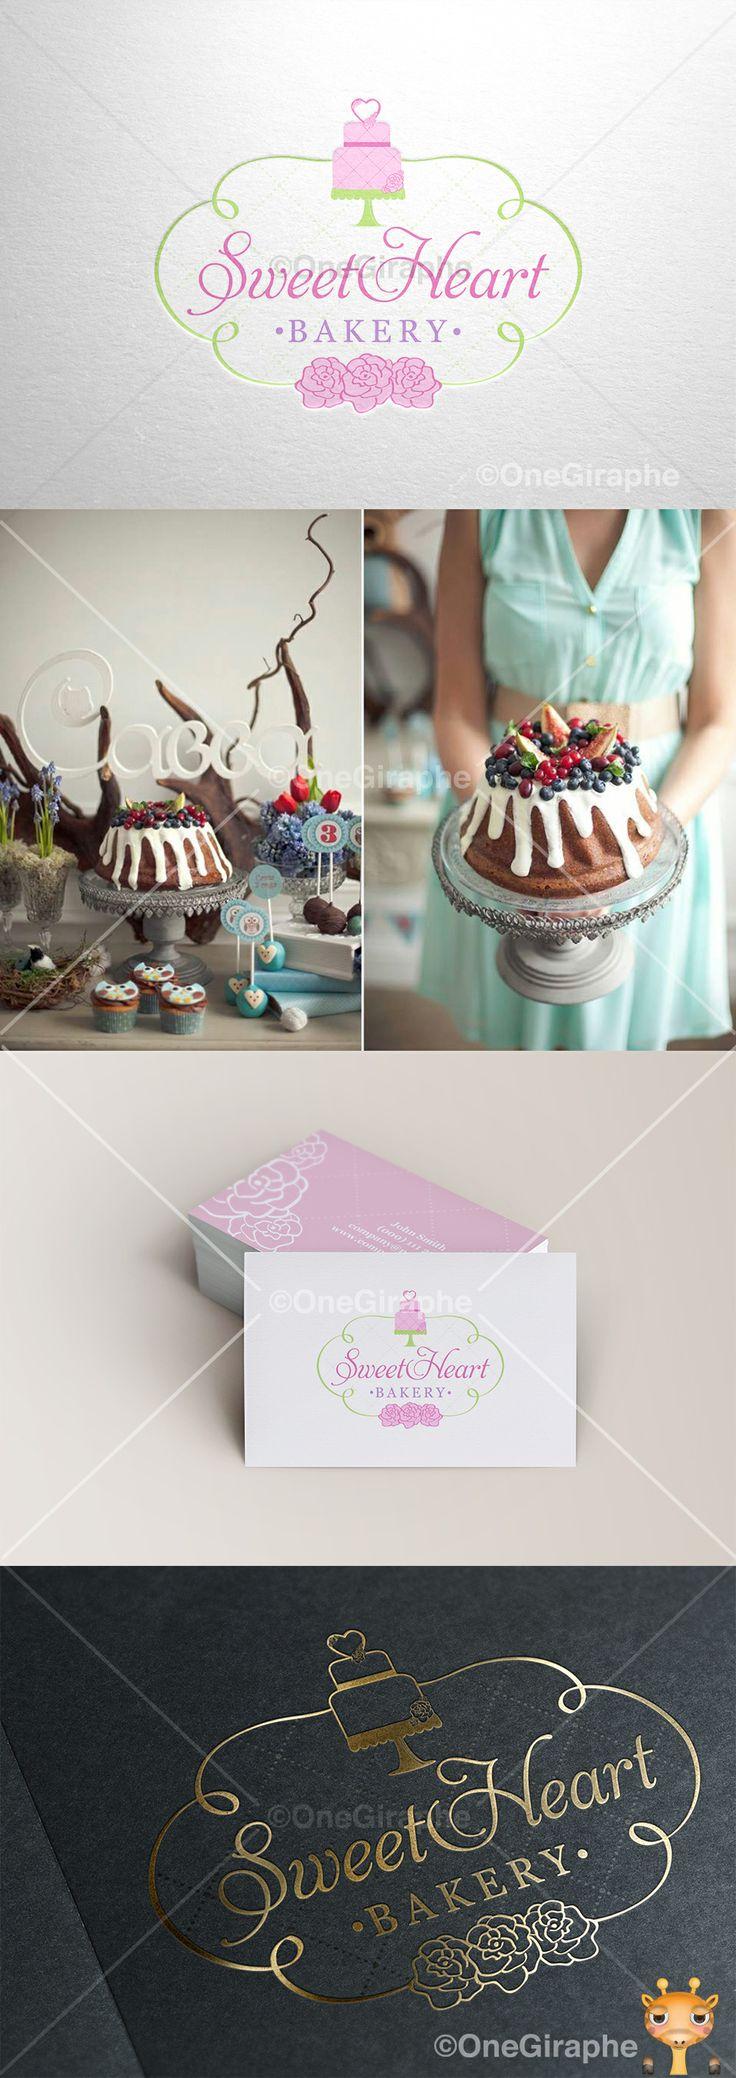 SweetHeart Bakery www.facebook.com/sweetheartbakerymoscow #cake #cupcake #cake #bake #bakery #logo #portfolio #design #graphic #graphicdesign #designer #cute #cake #stand #cupcake #pink #behance #logopond #brandstack #bestdesigner #brand #identity #brandidentity #gold #clasic #portfolio #professional